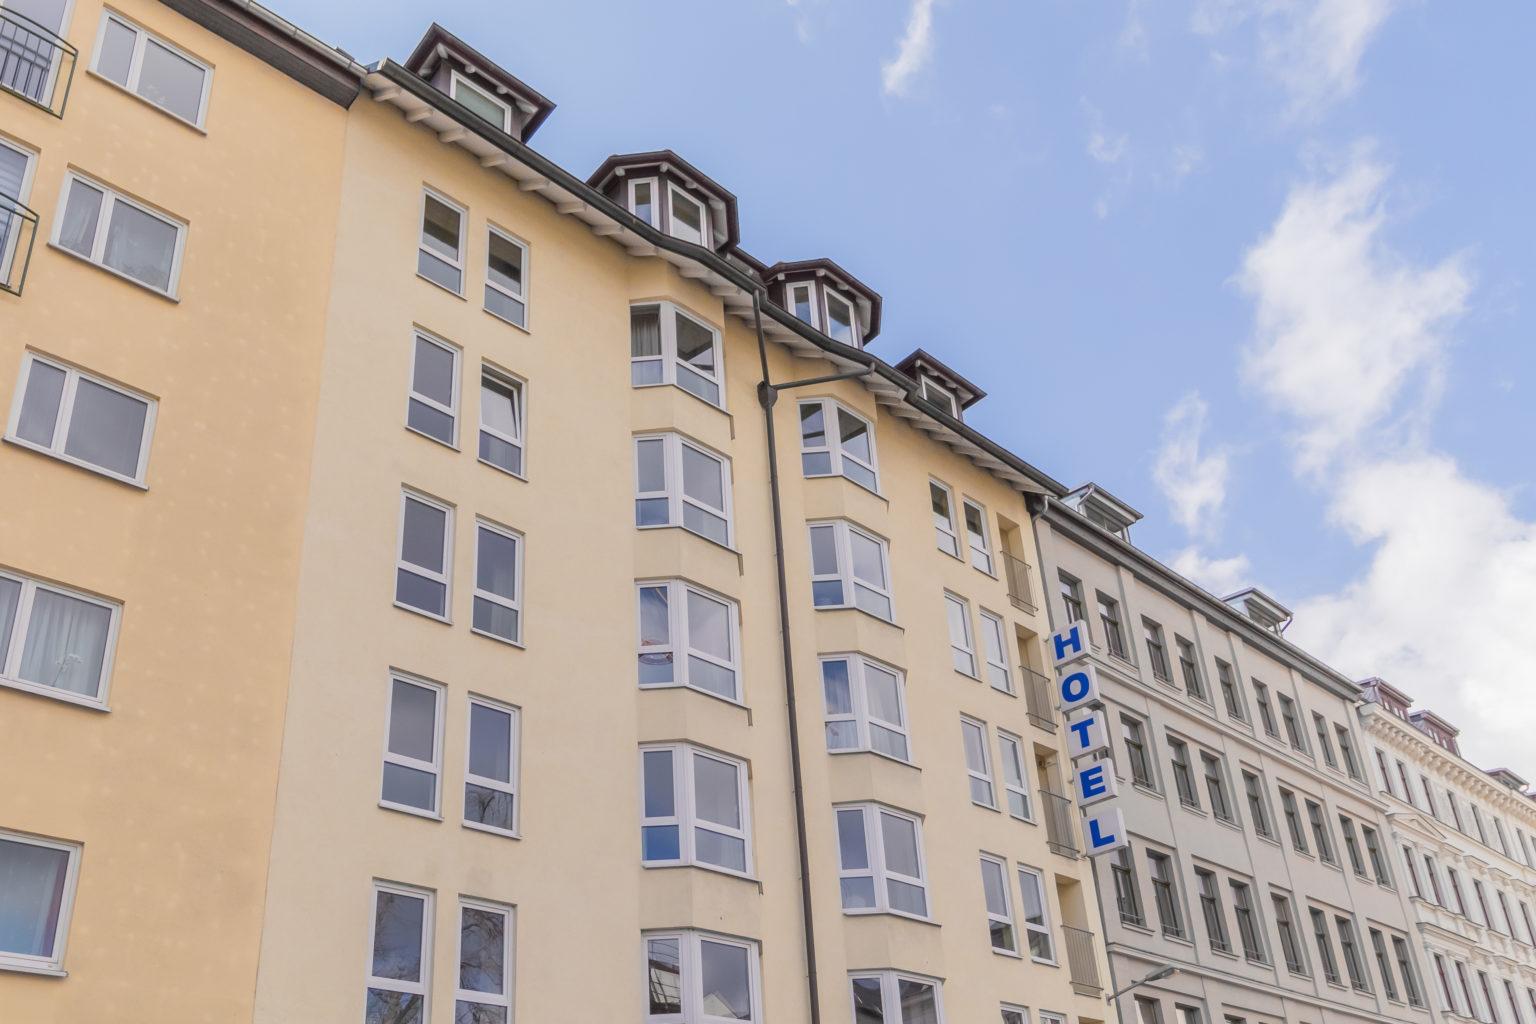 Markgraf Hotel Leipzig